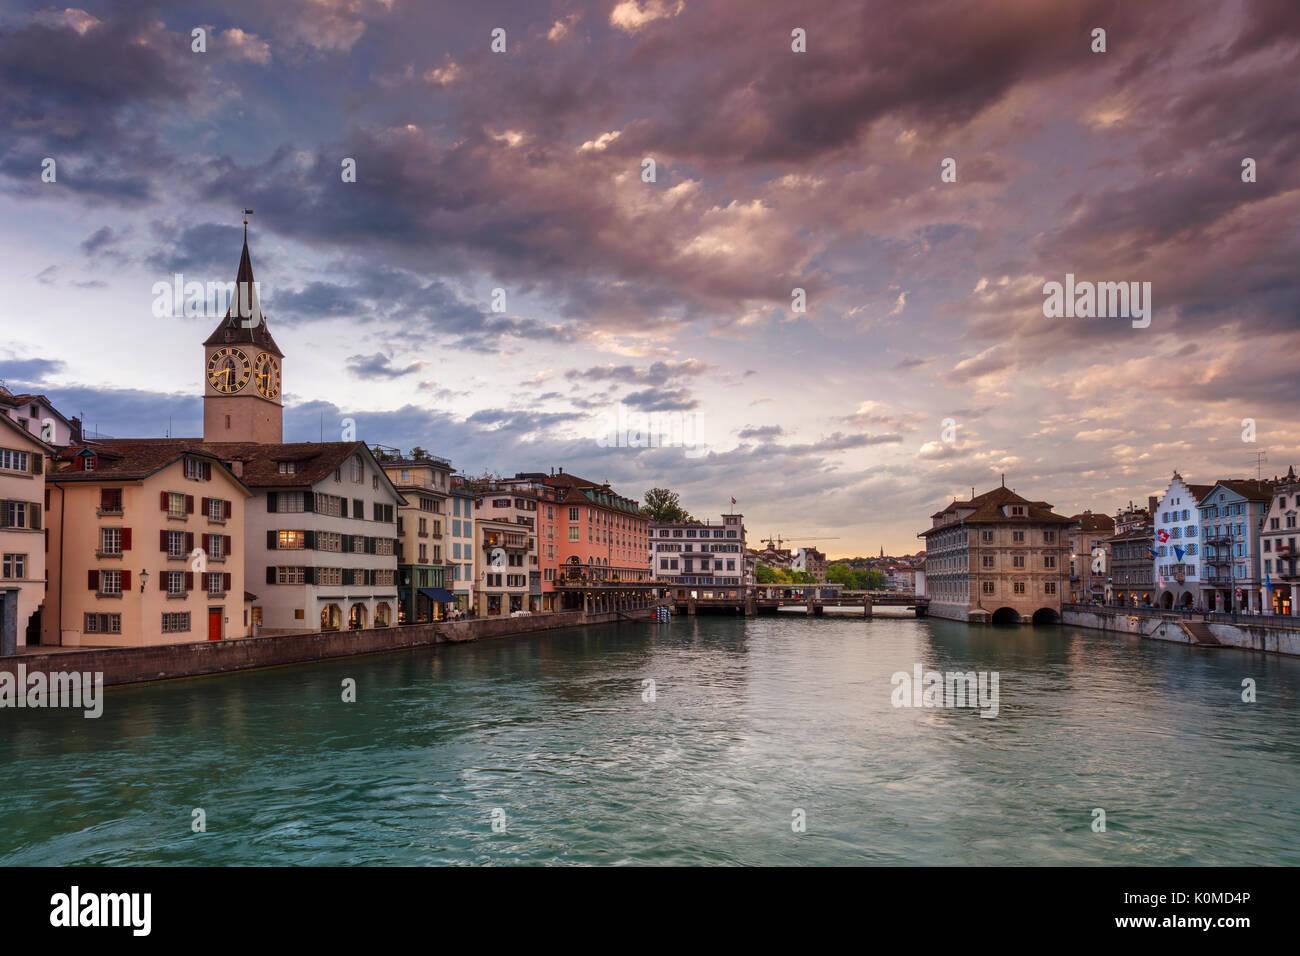 Zurich. Cityscape image of Zurich, Switzerland during dramatic sunset. - Stock Image